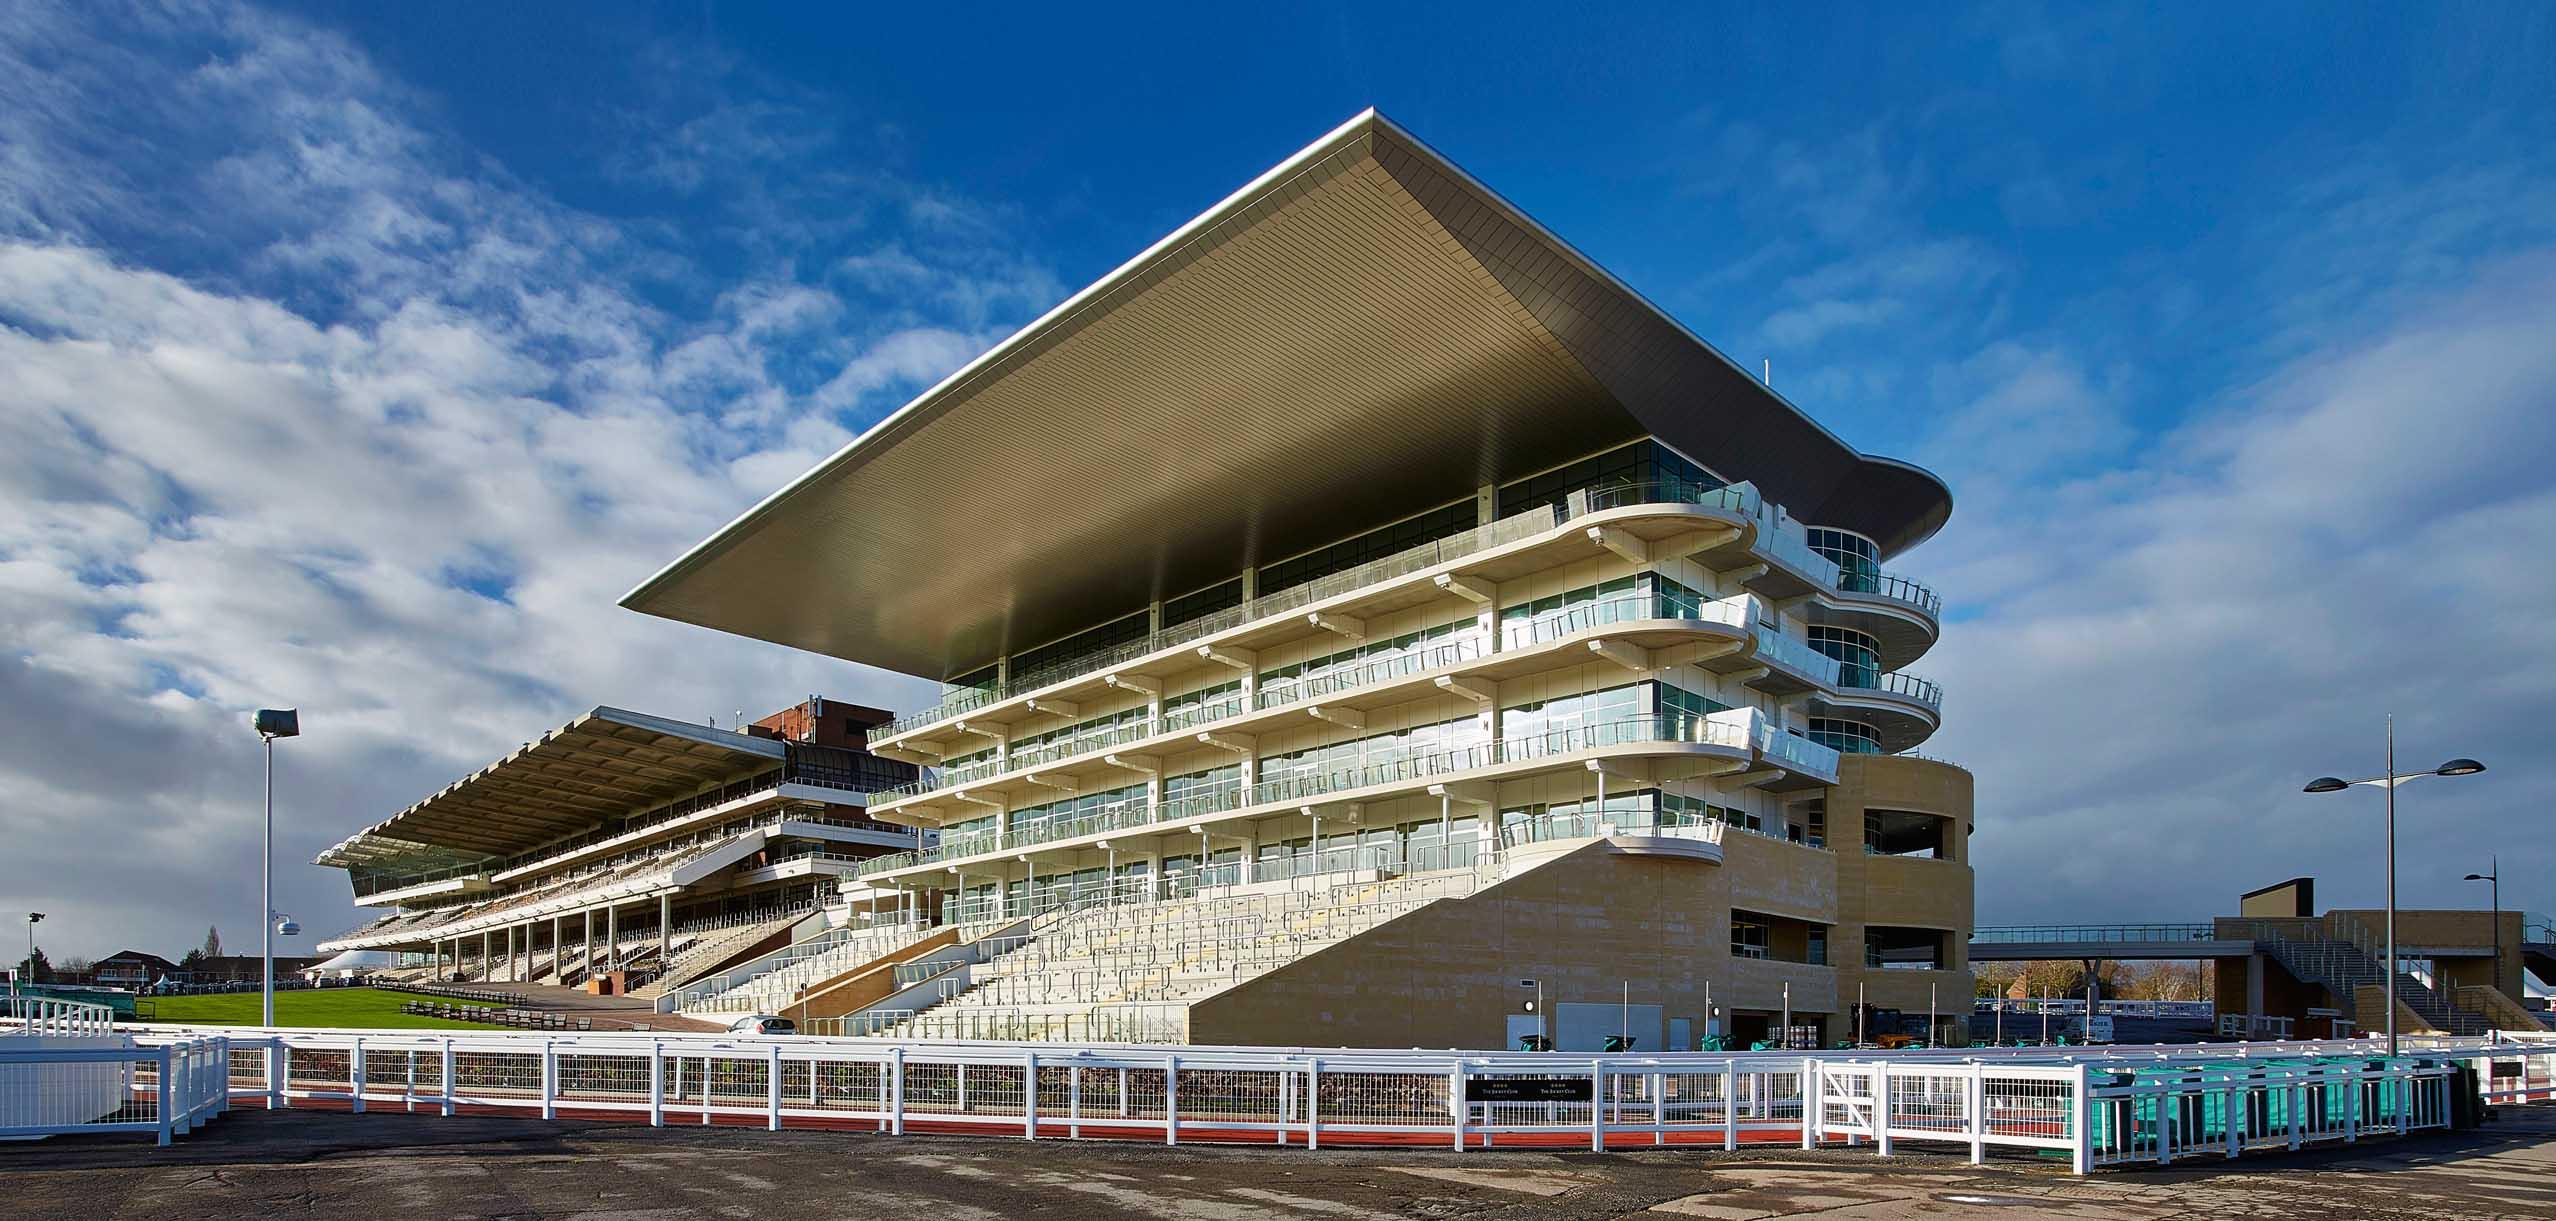 Cheltenham Racecourse Grandstand Roofing Amp Cladding